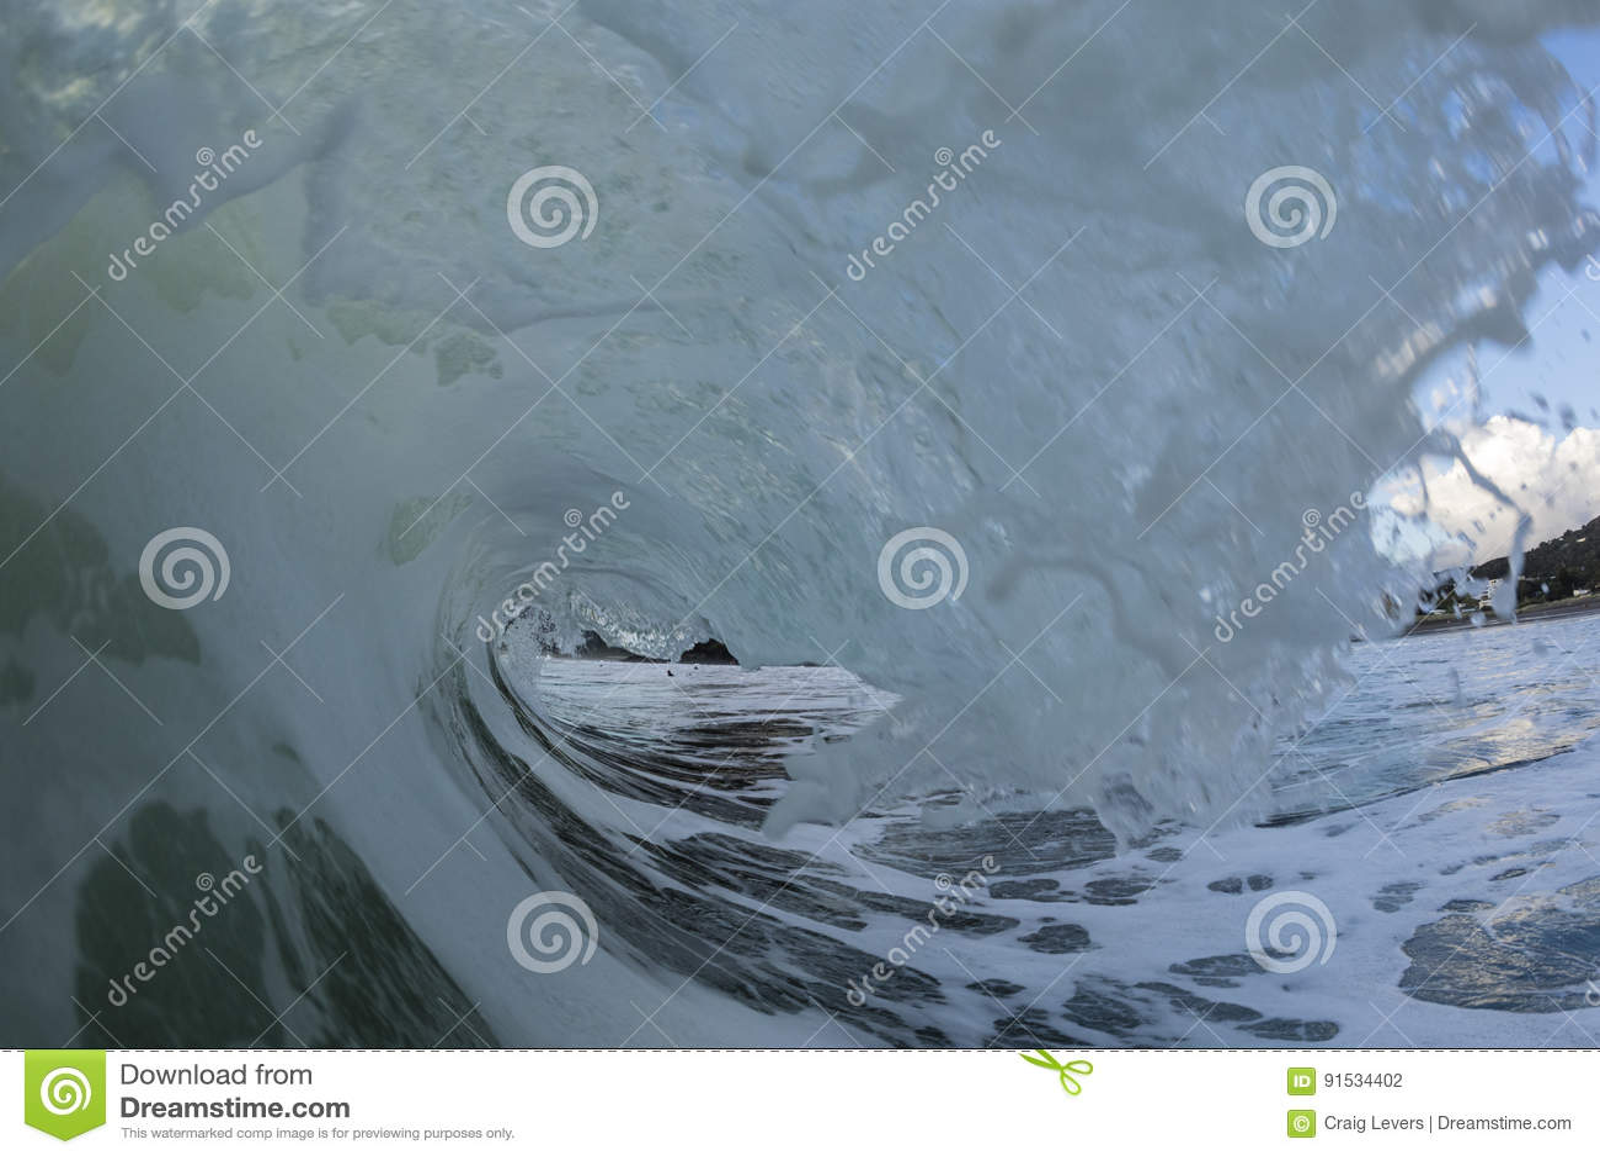 Piha Wave Tubing